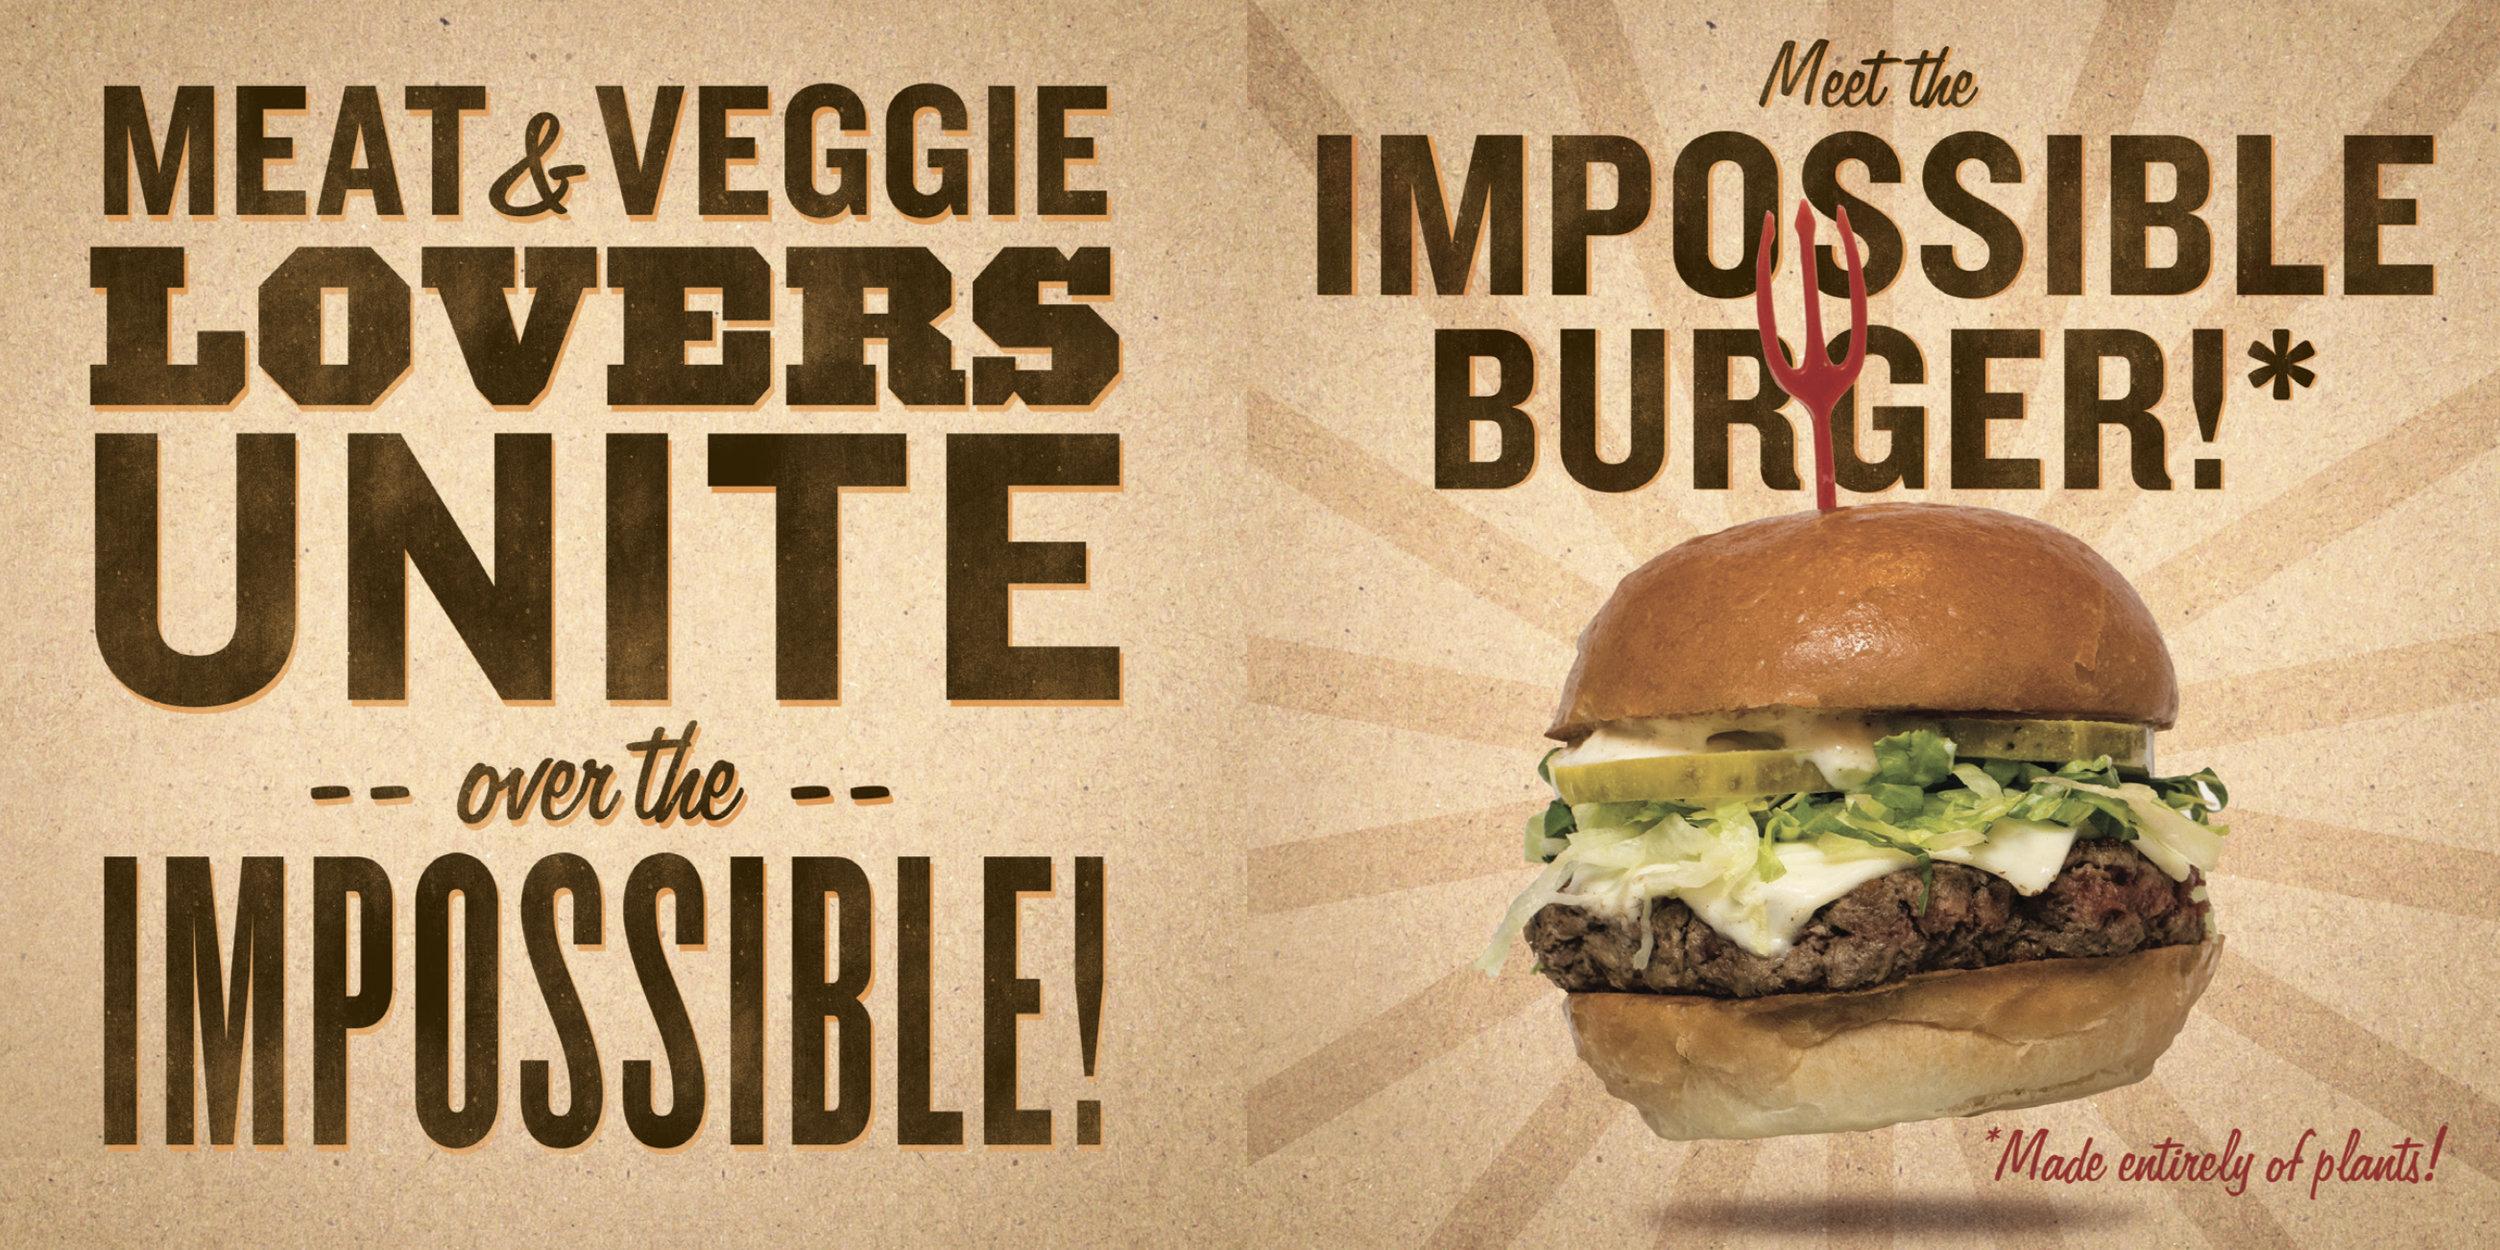 burgatroy_impossible_burger_Bootstrap_design_co.jpg